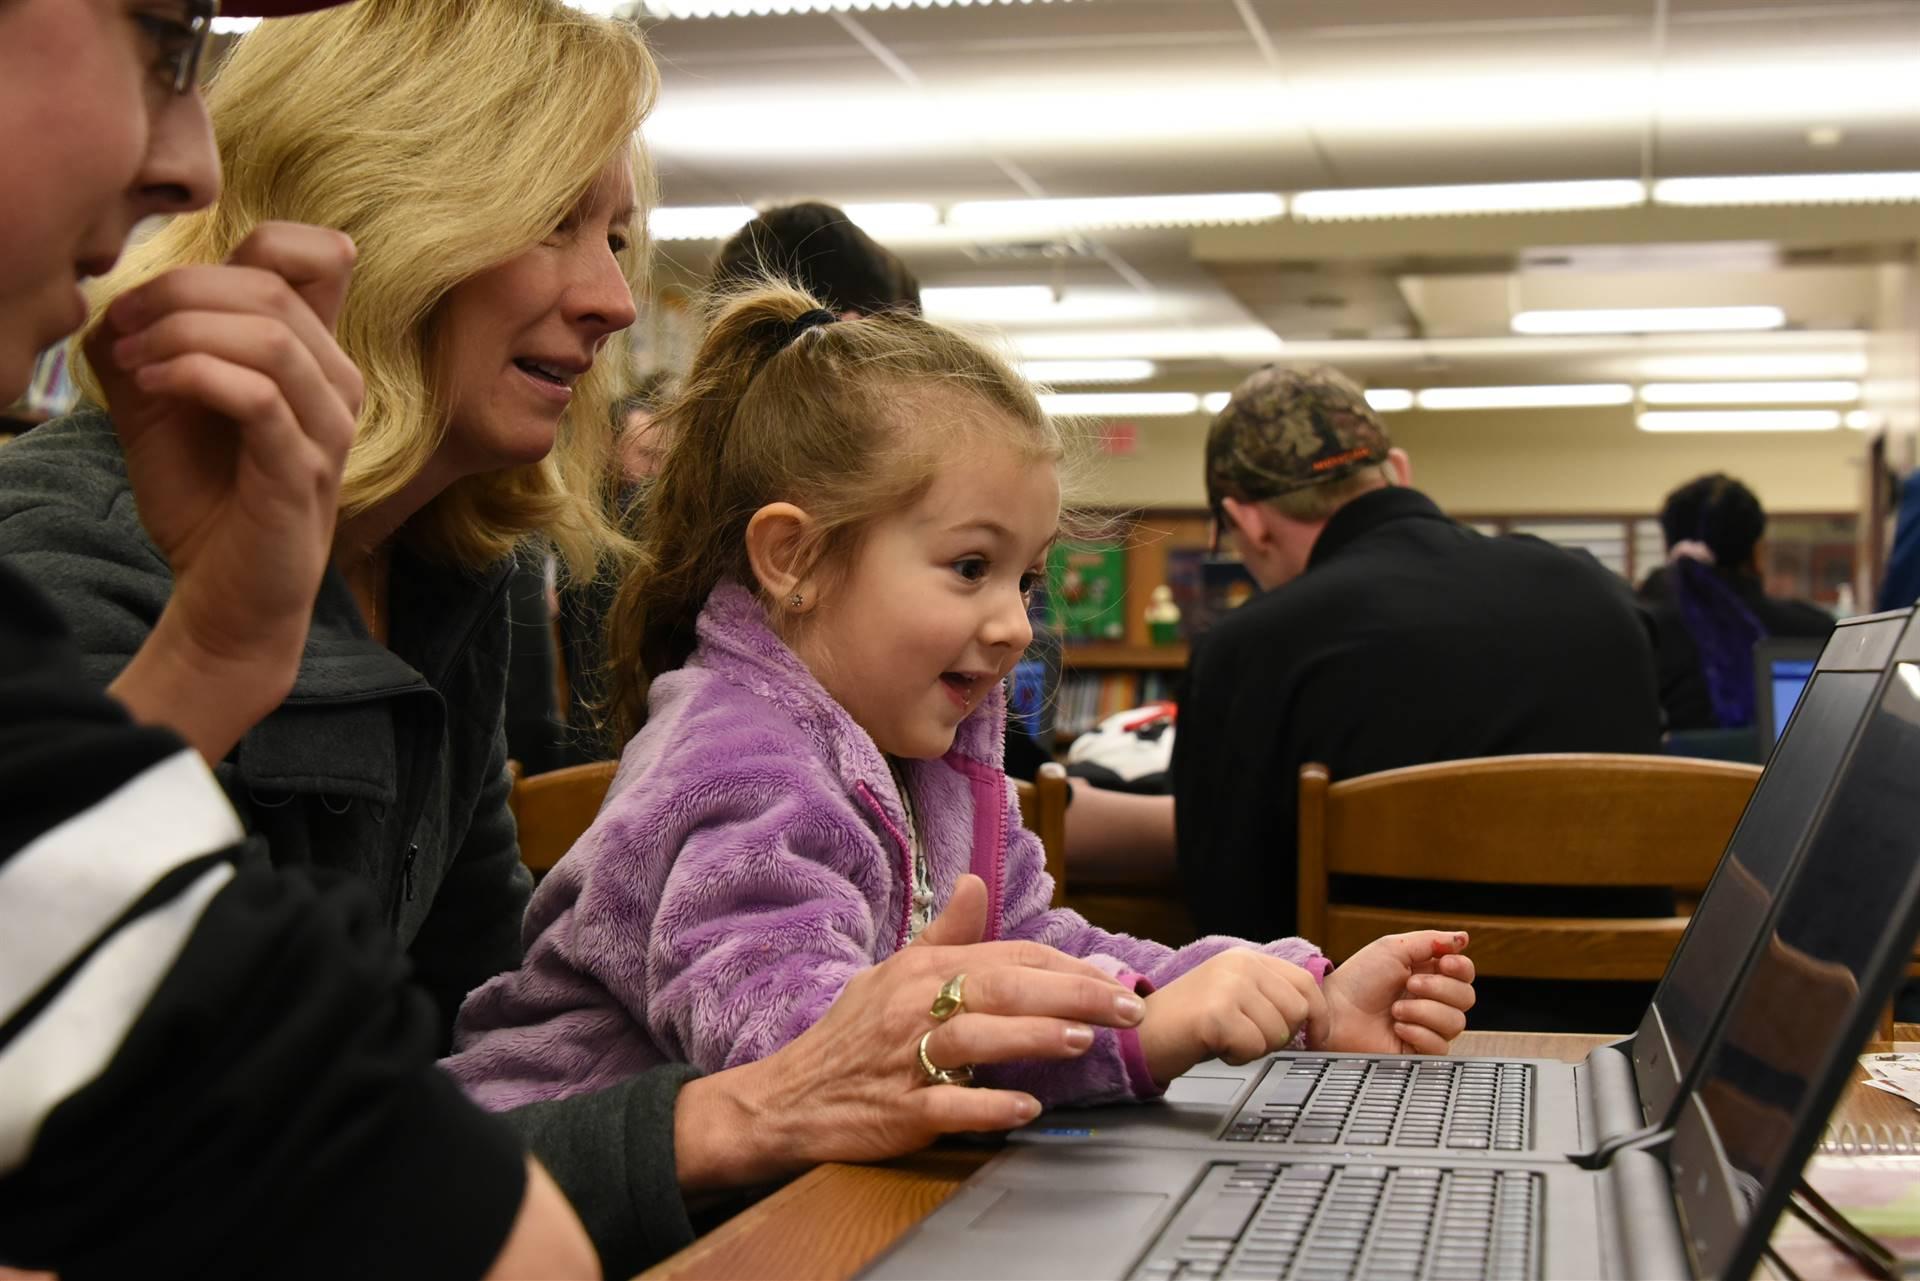 Preschoolers learn computer coding